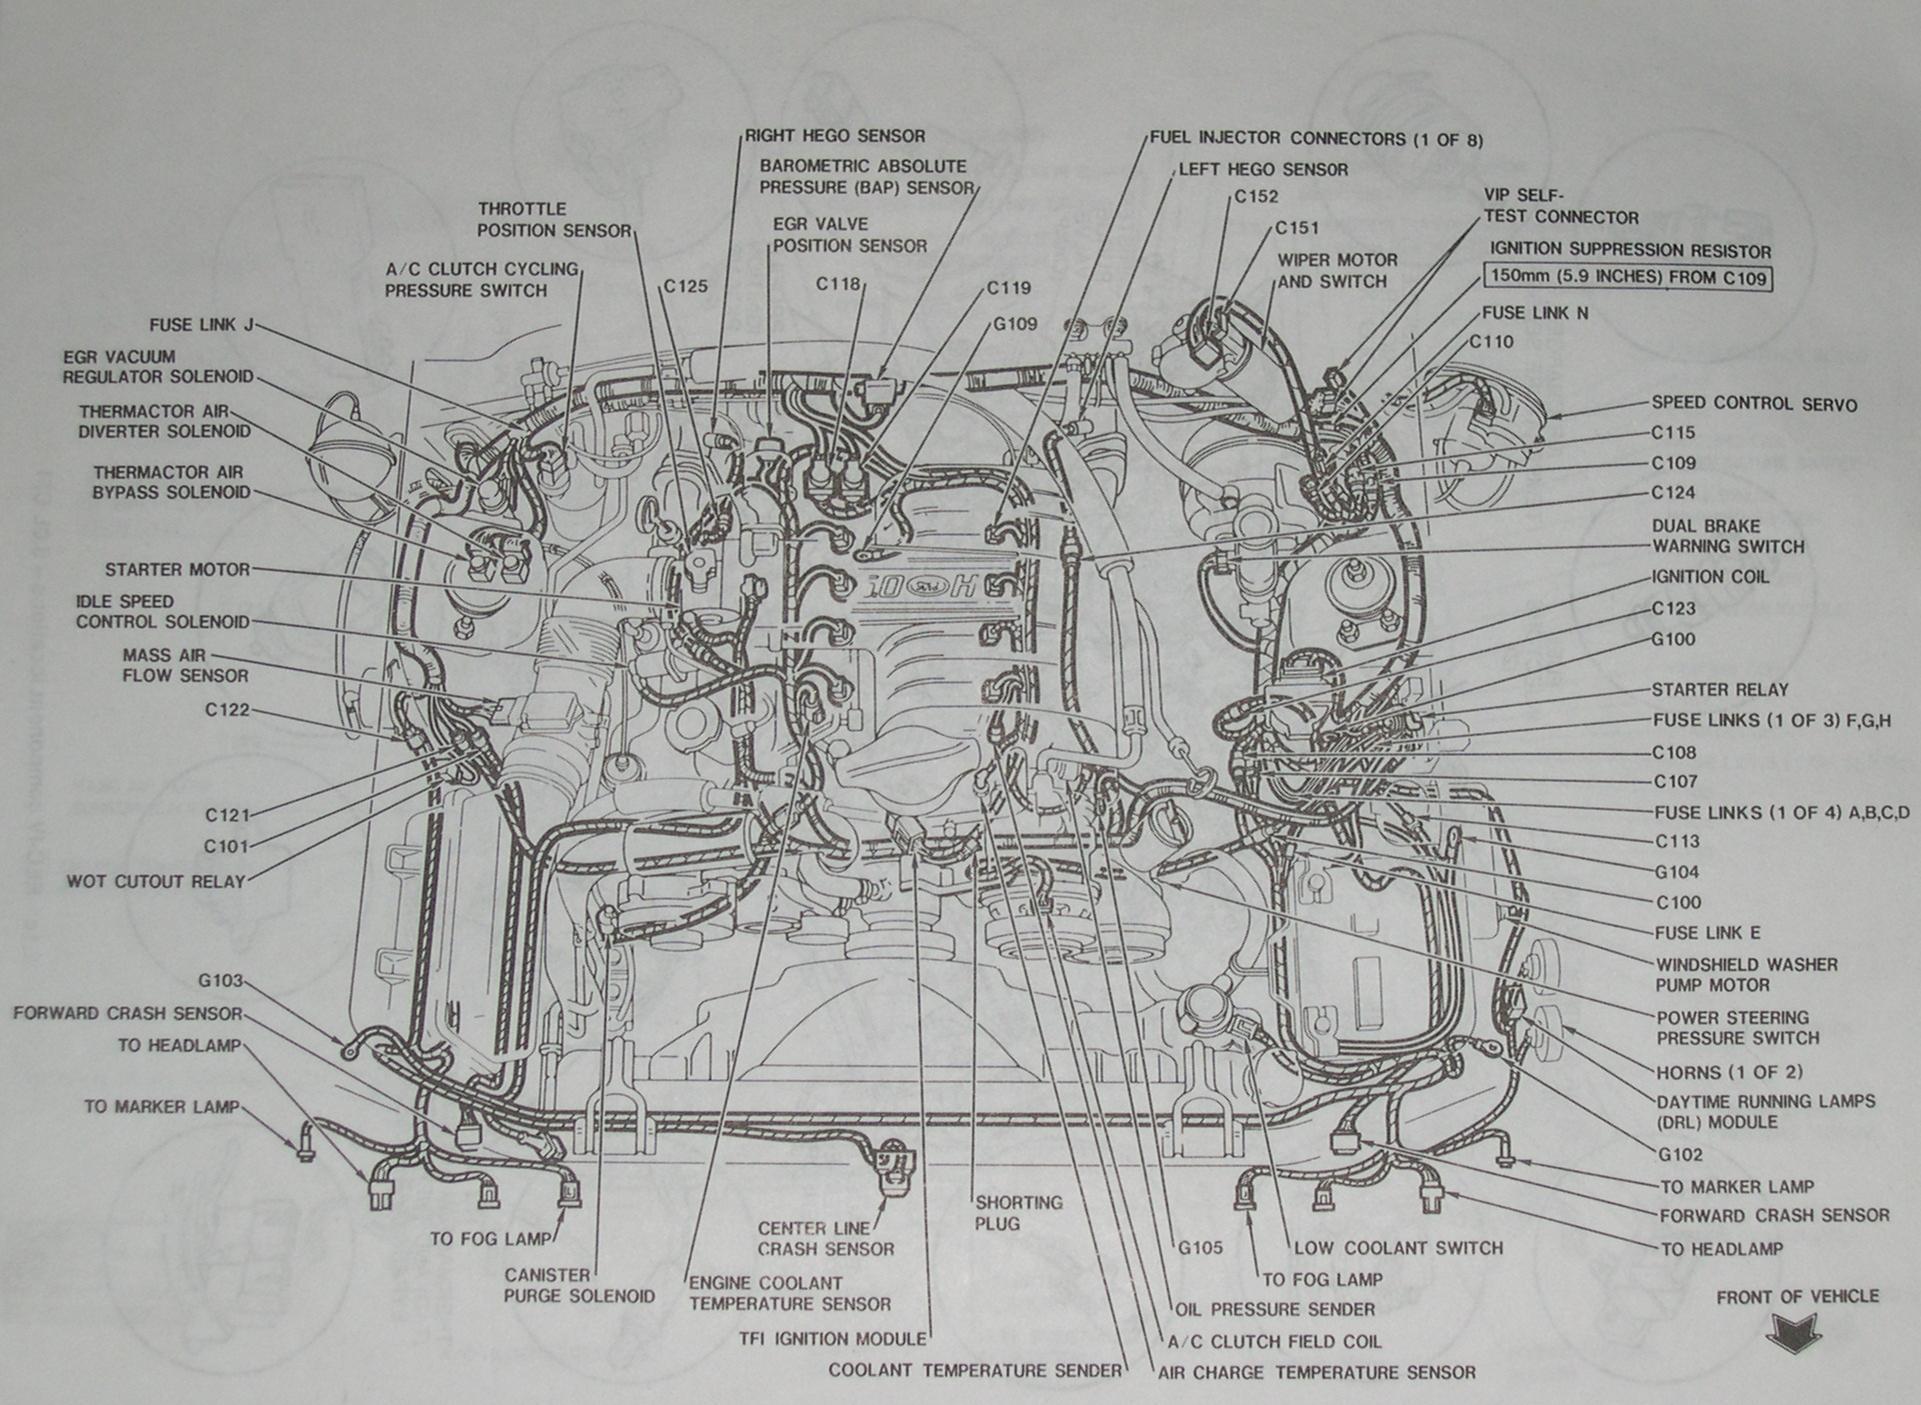 1980s ford 5 0 engine diagram wiring diagram preview 5 0 Liter Cobra Engine